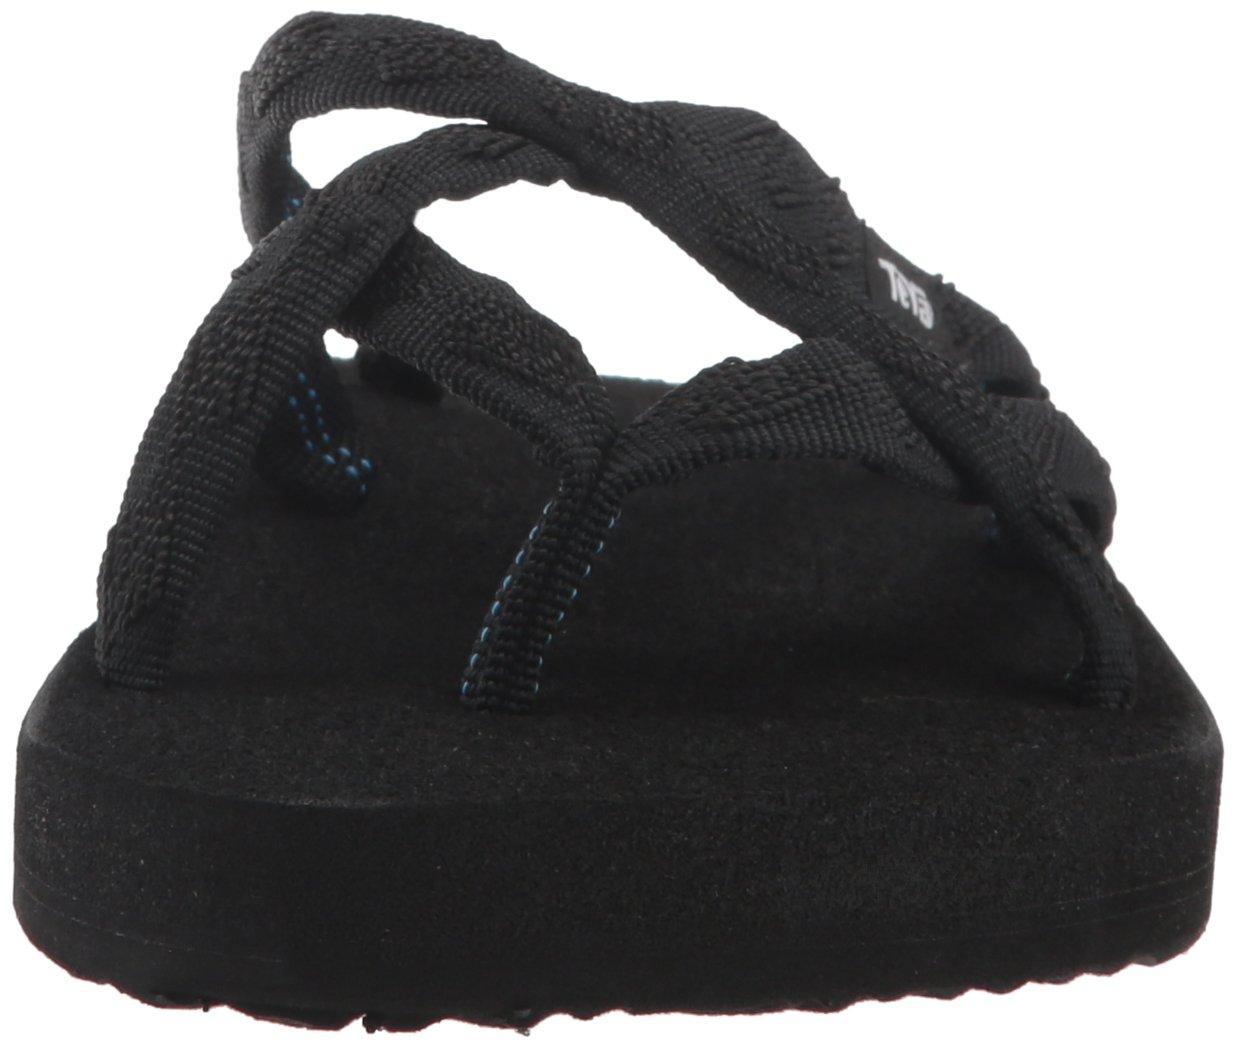 Teva Olowahu W's Sandalen Damen Sport- & Outdoor Sandalen W's Mix B schwarz On schwarz 4cb7f6